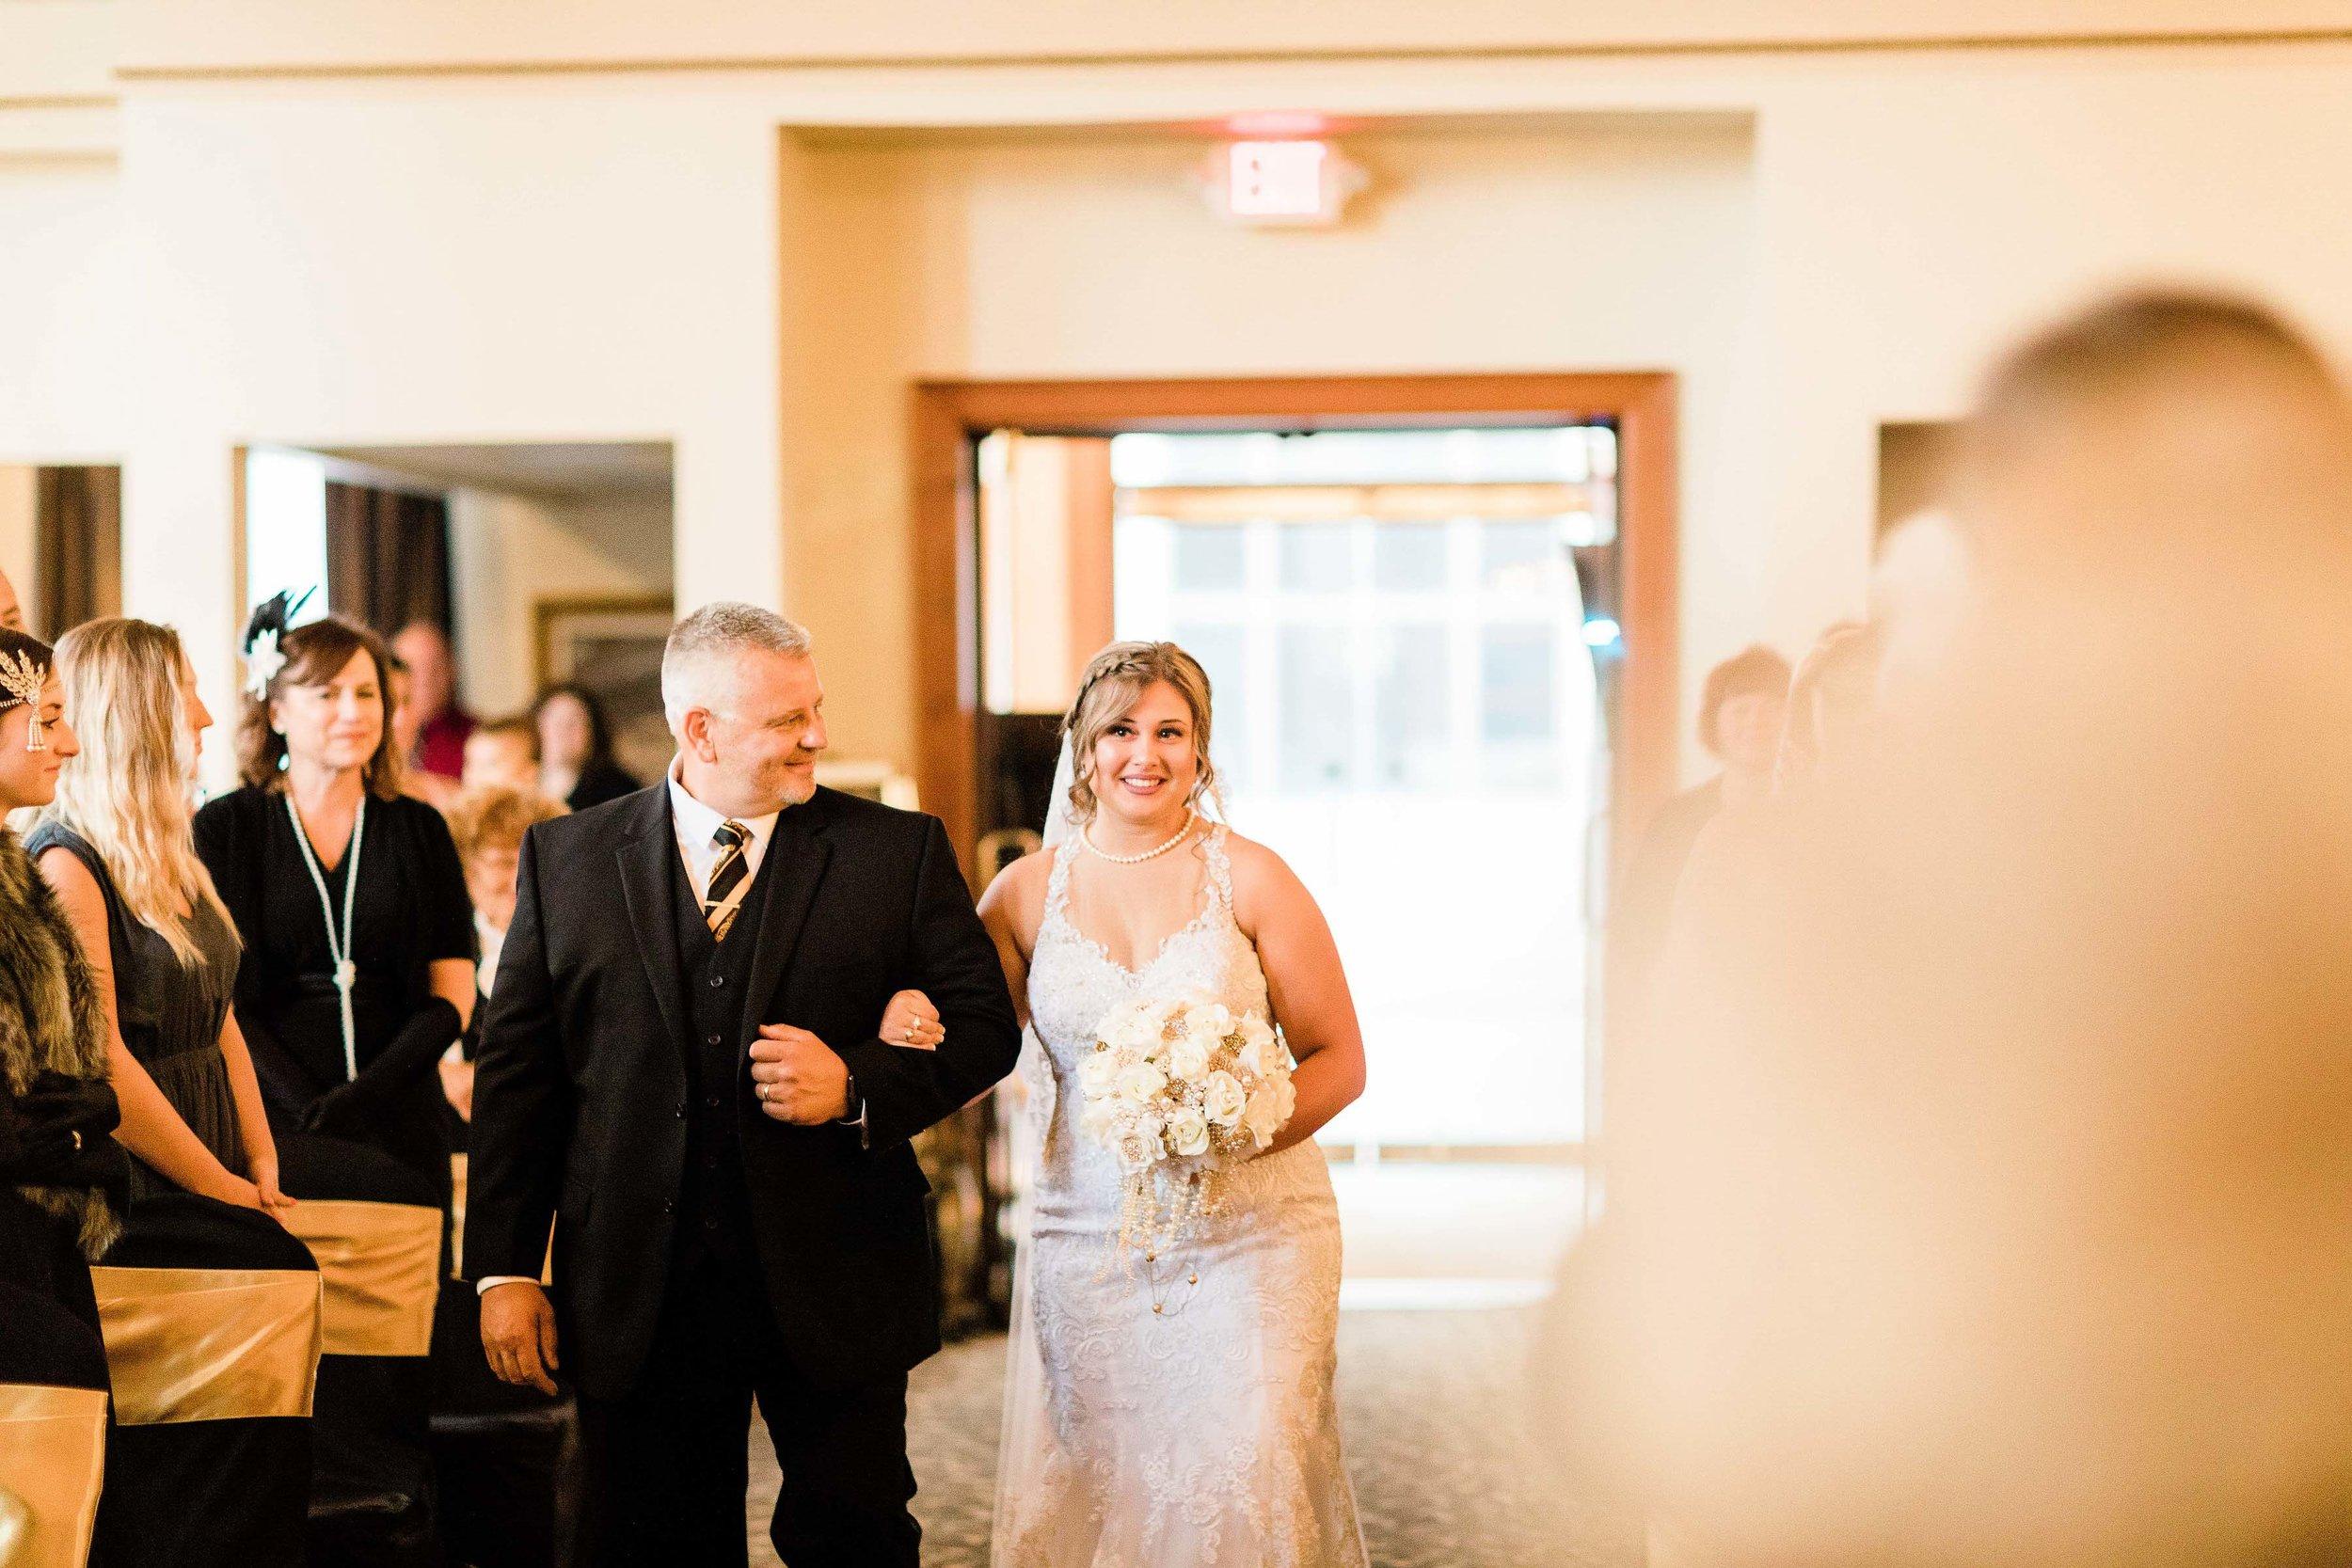 middletown ohio wedding photographer windamere-2.jpg